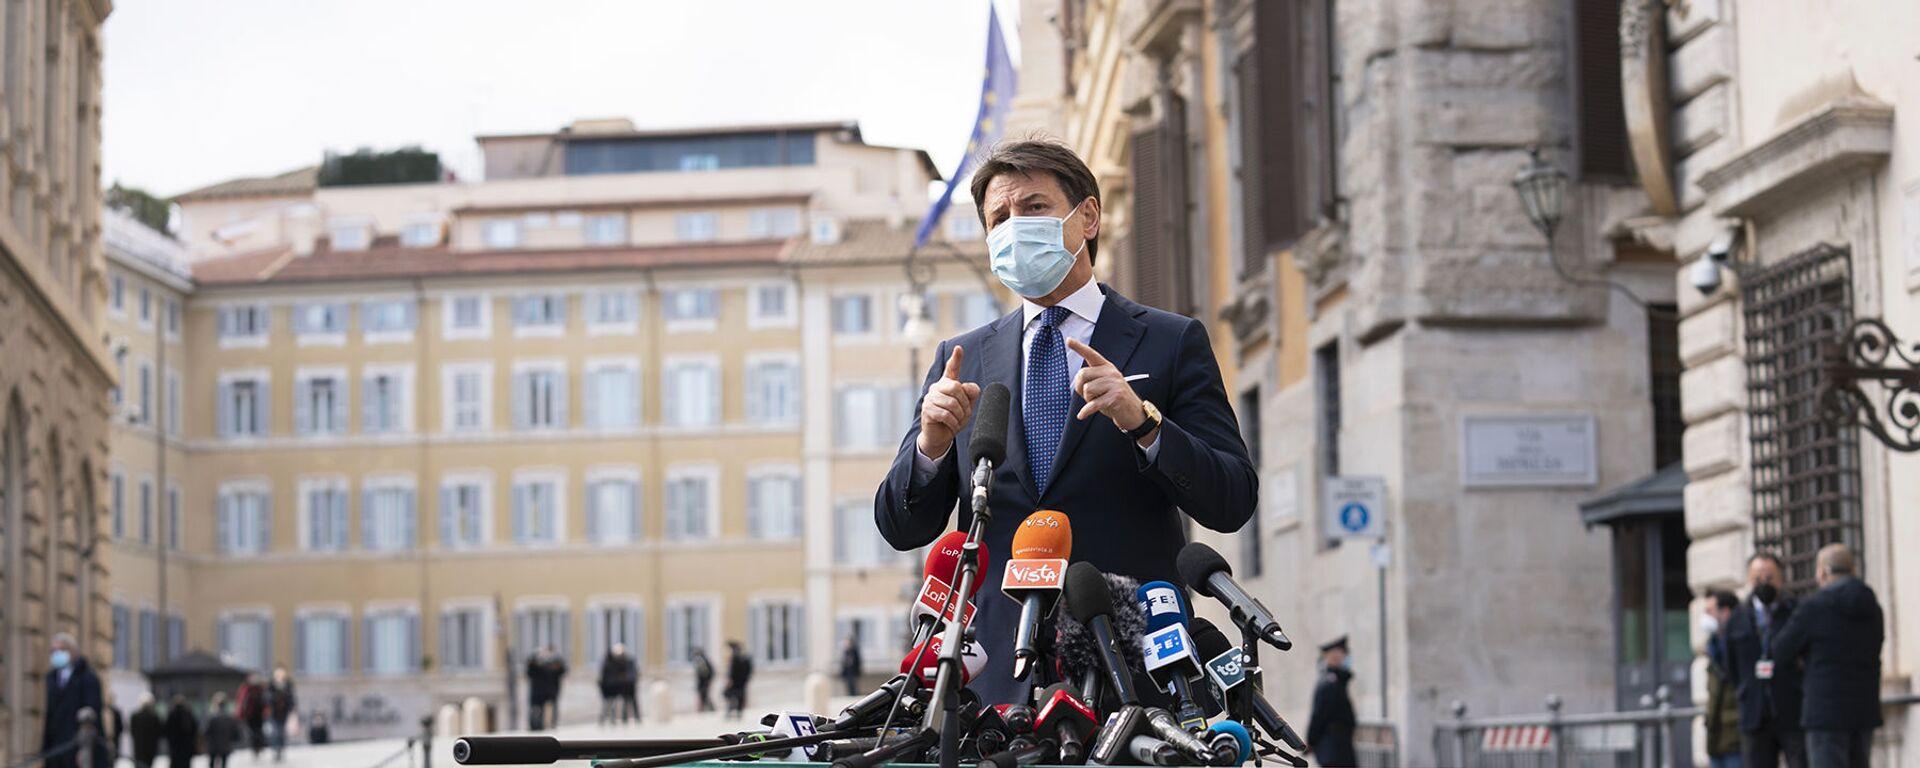 Giuseppe Conte incontra la stampa  - Sputnik Italia, 1920, 14.02.2021